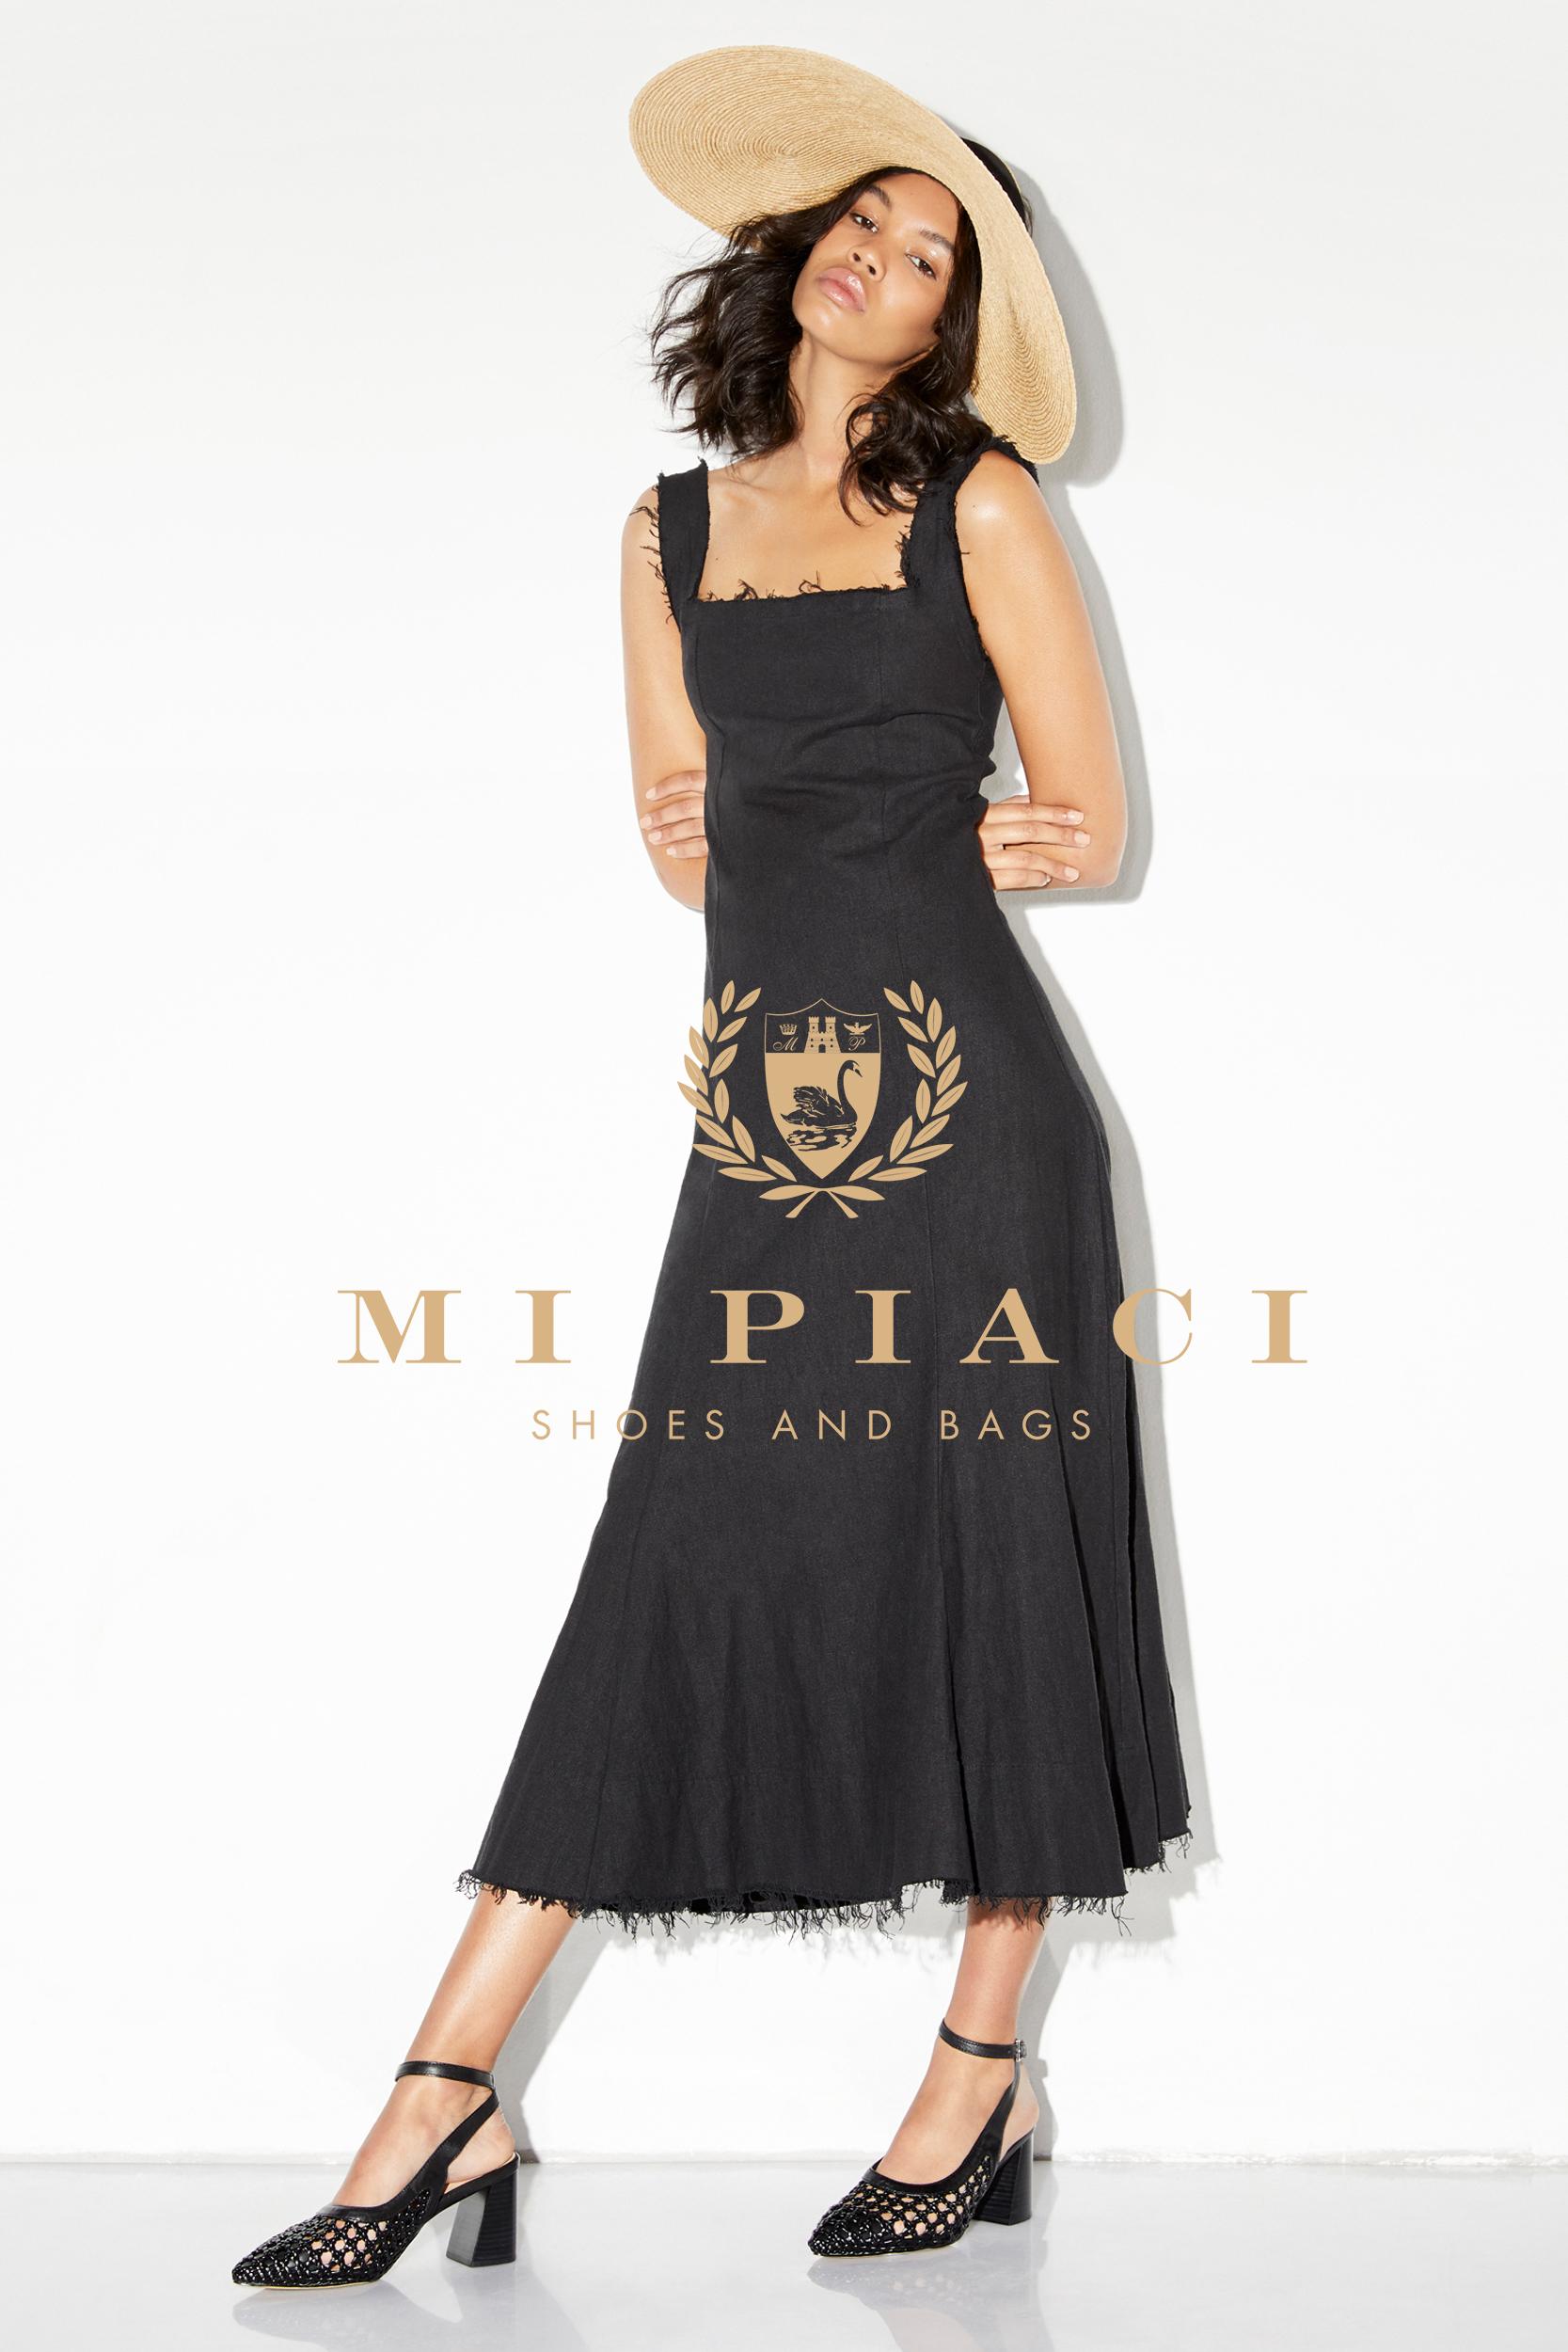 MI PIACI - A SELECTION OF DESIGN WORK FOR THE MI PIACI BRAND